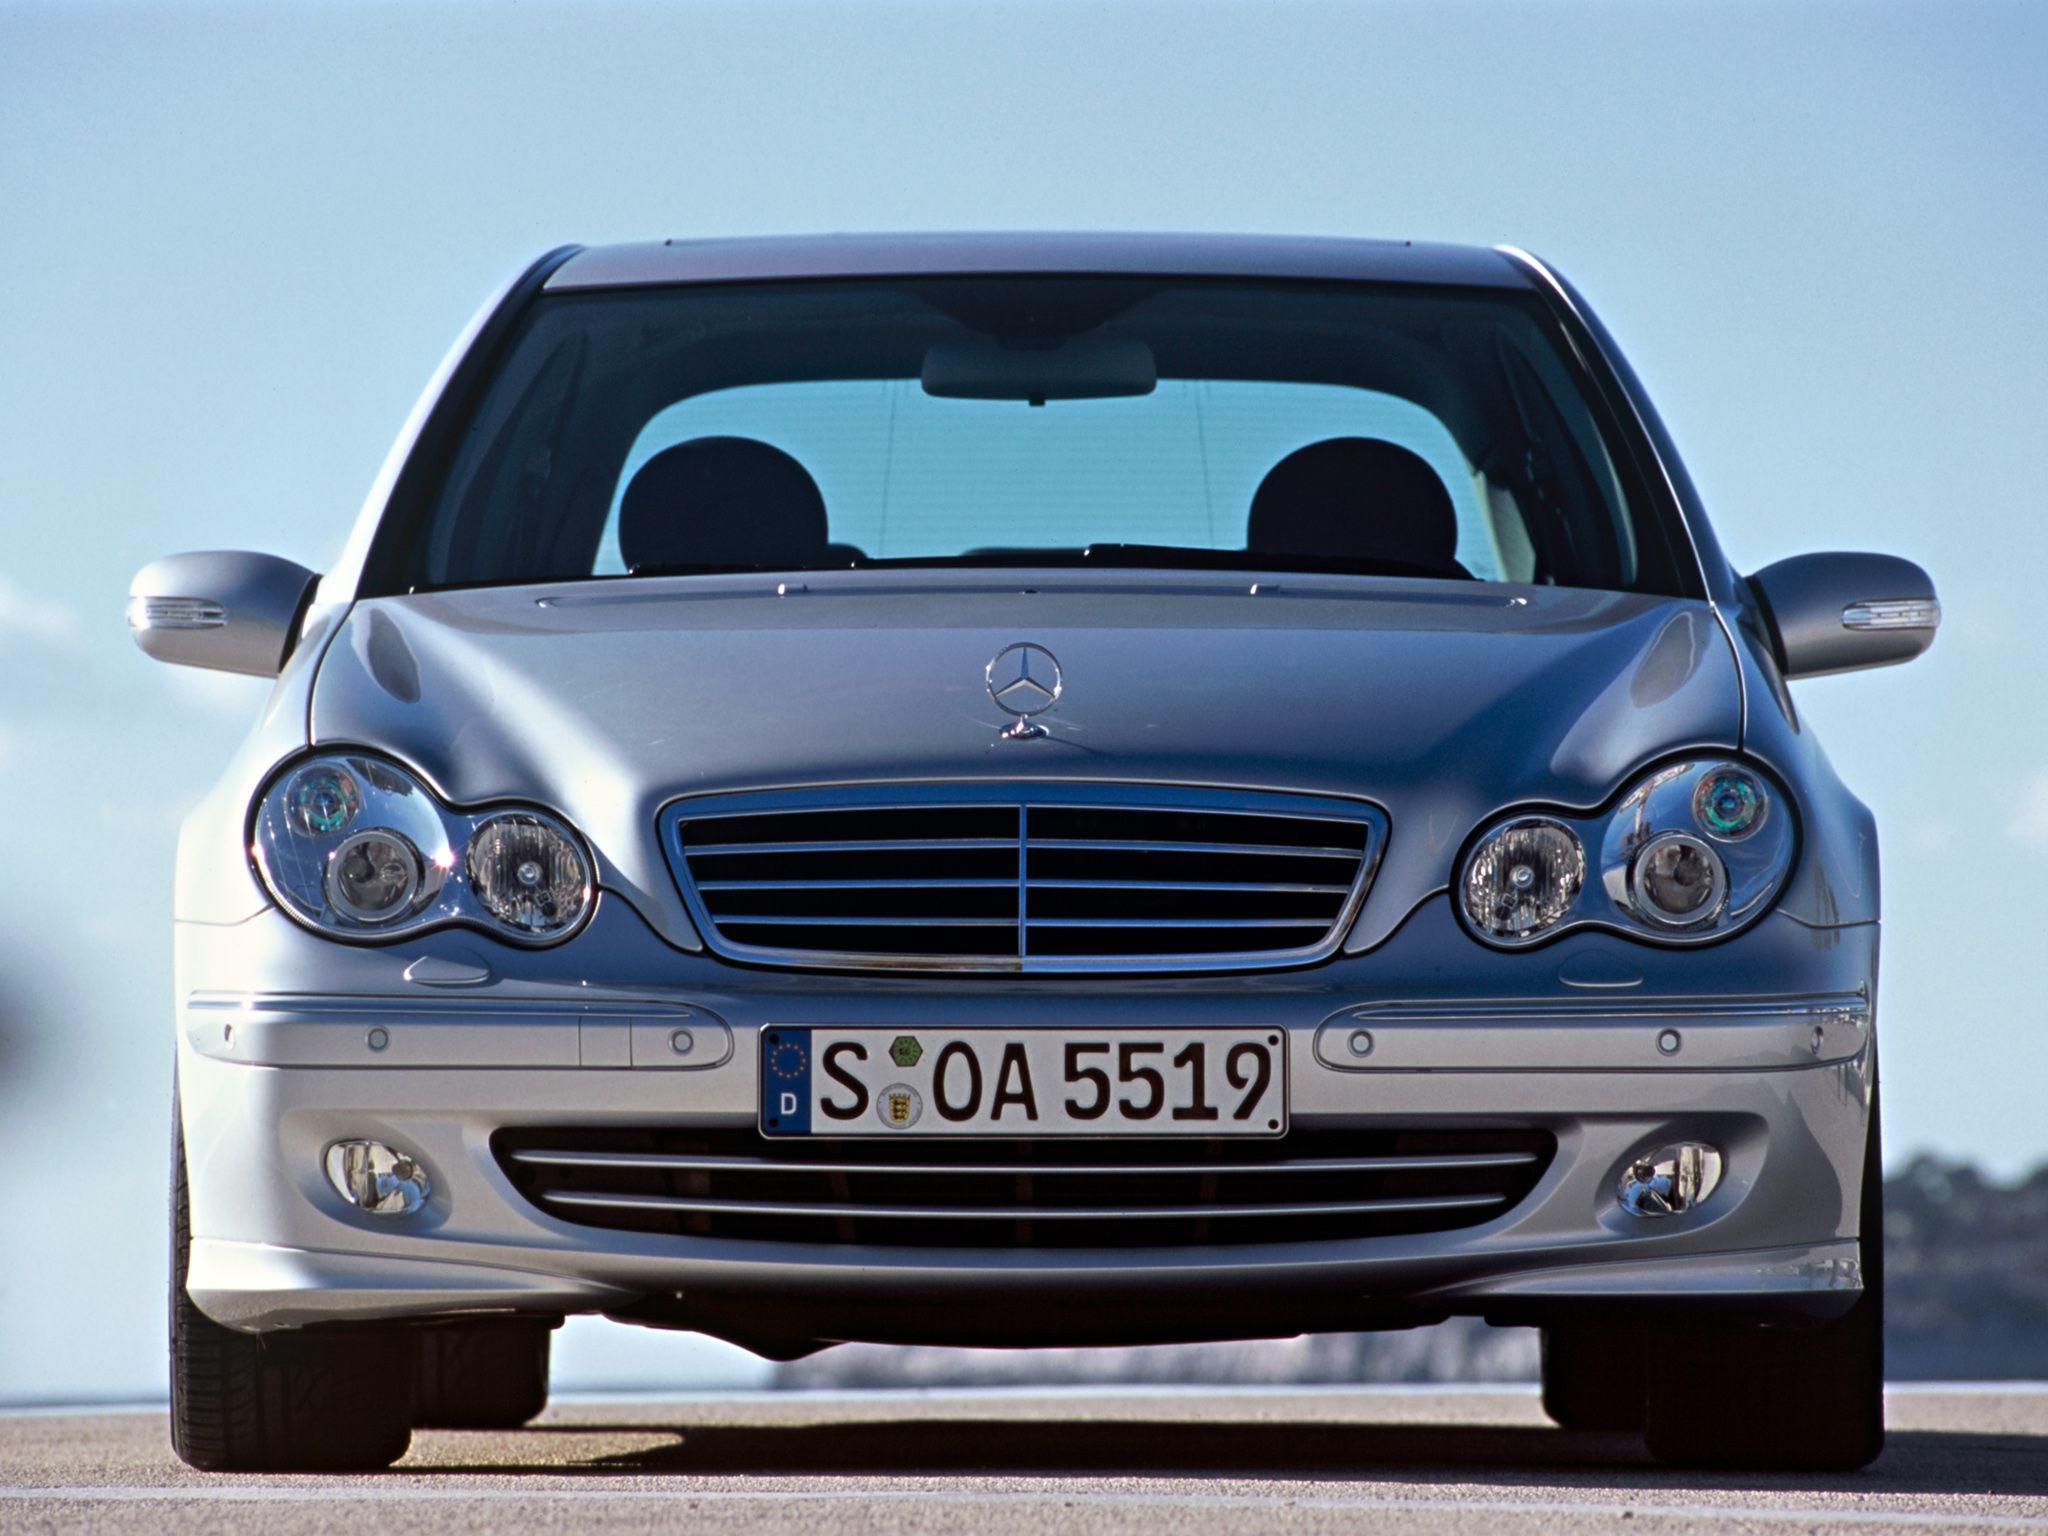 Mercedes Benz C 220 Cdi W203 2000 07 Coches Mercedes Benz Autos Mercedes Benz